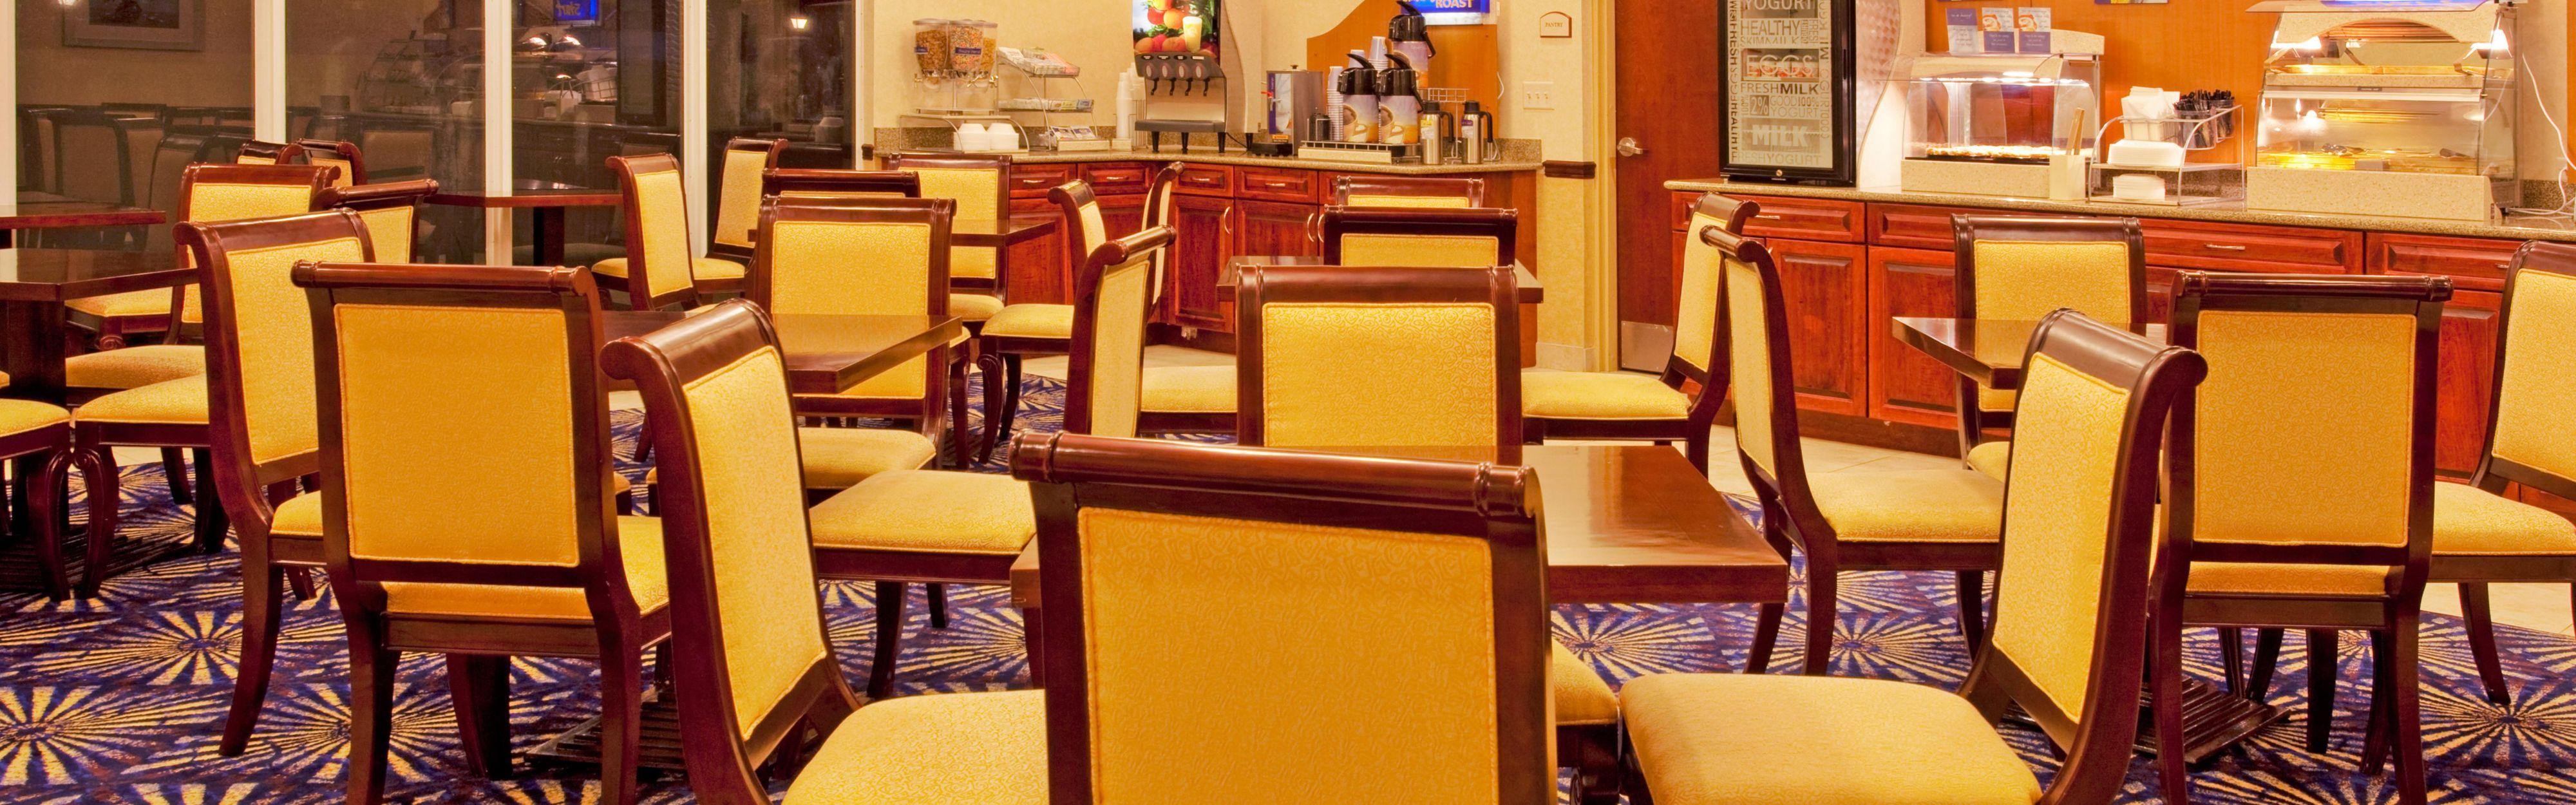 Holiday Inn Express Brooksville-I-75 image 3